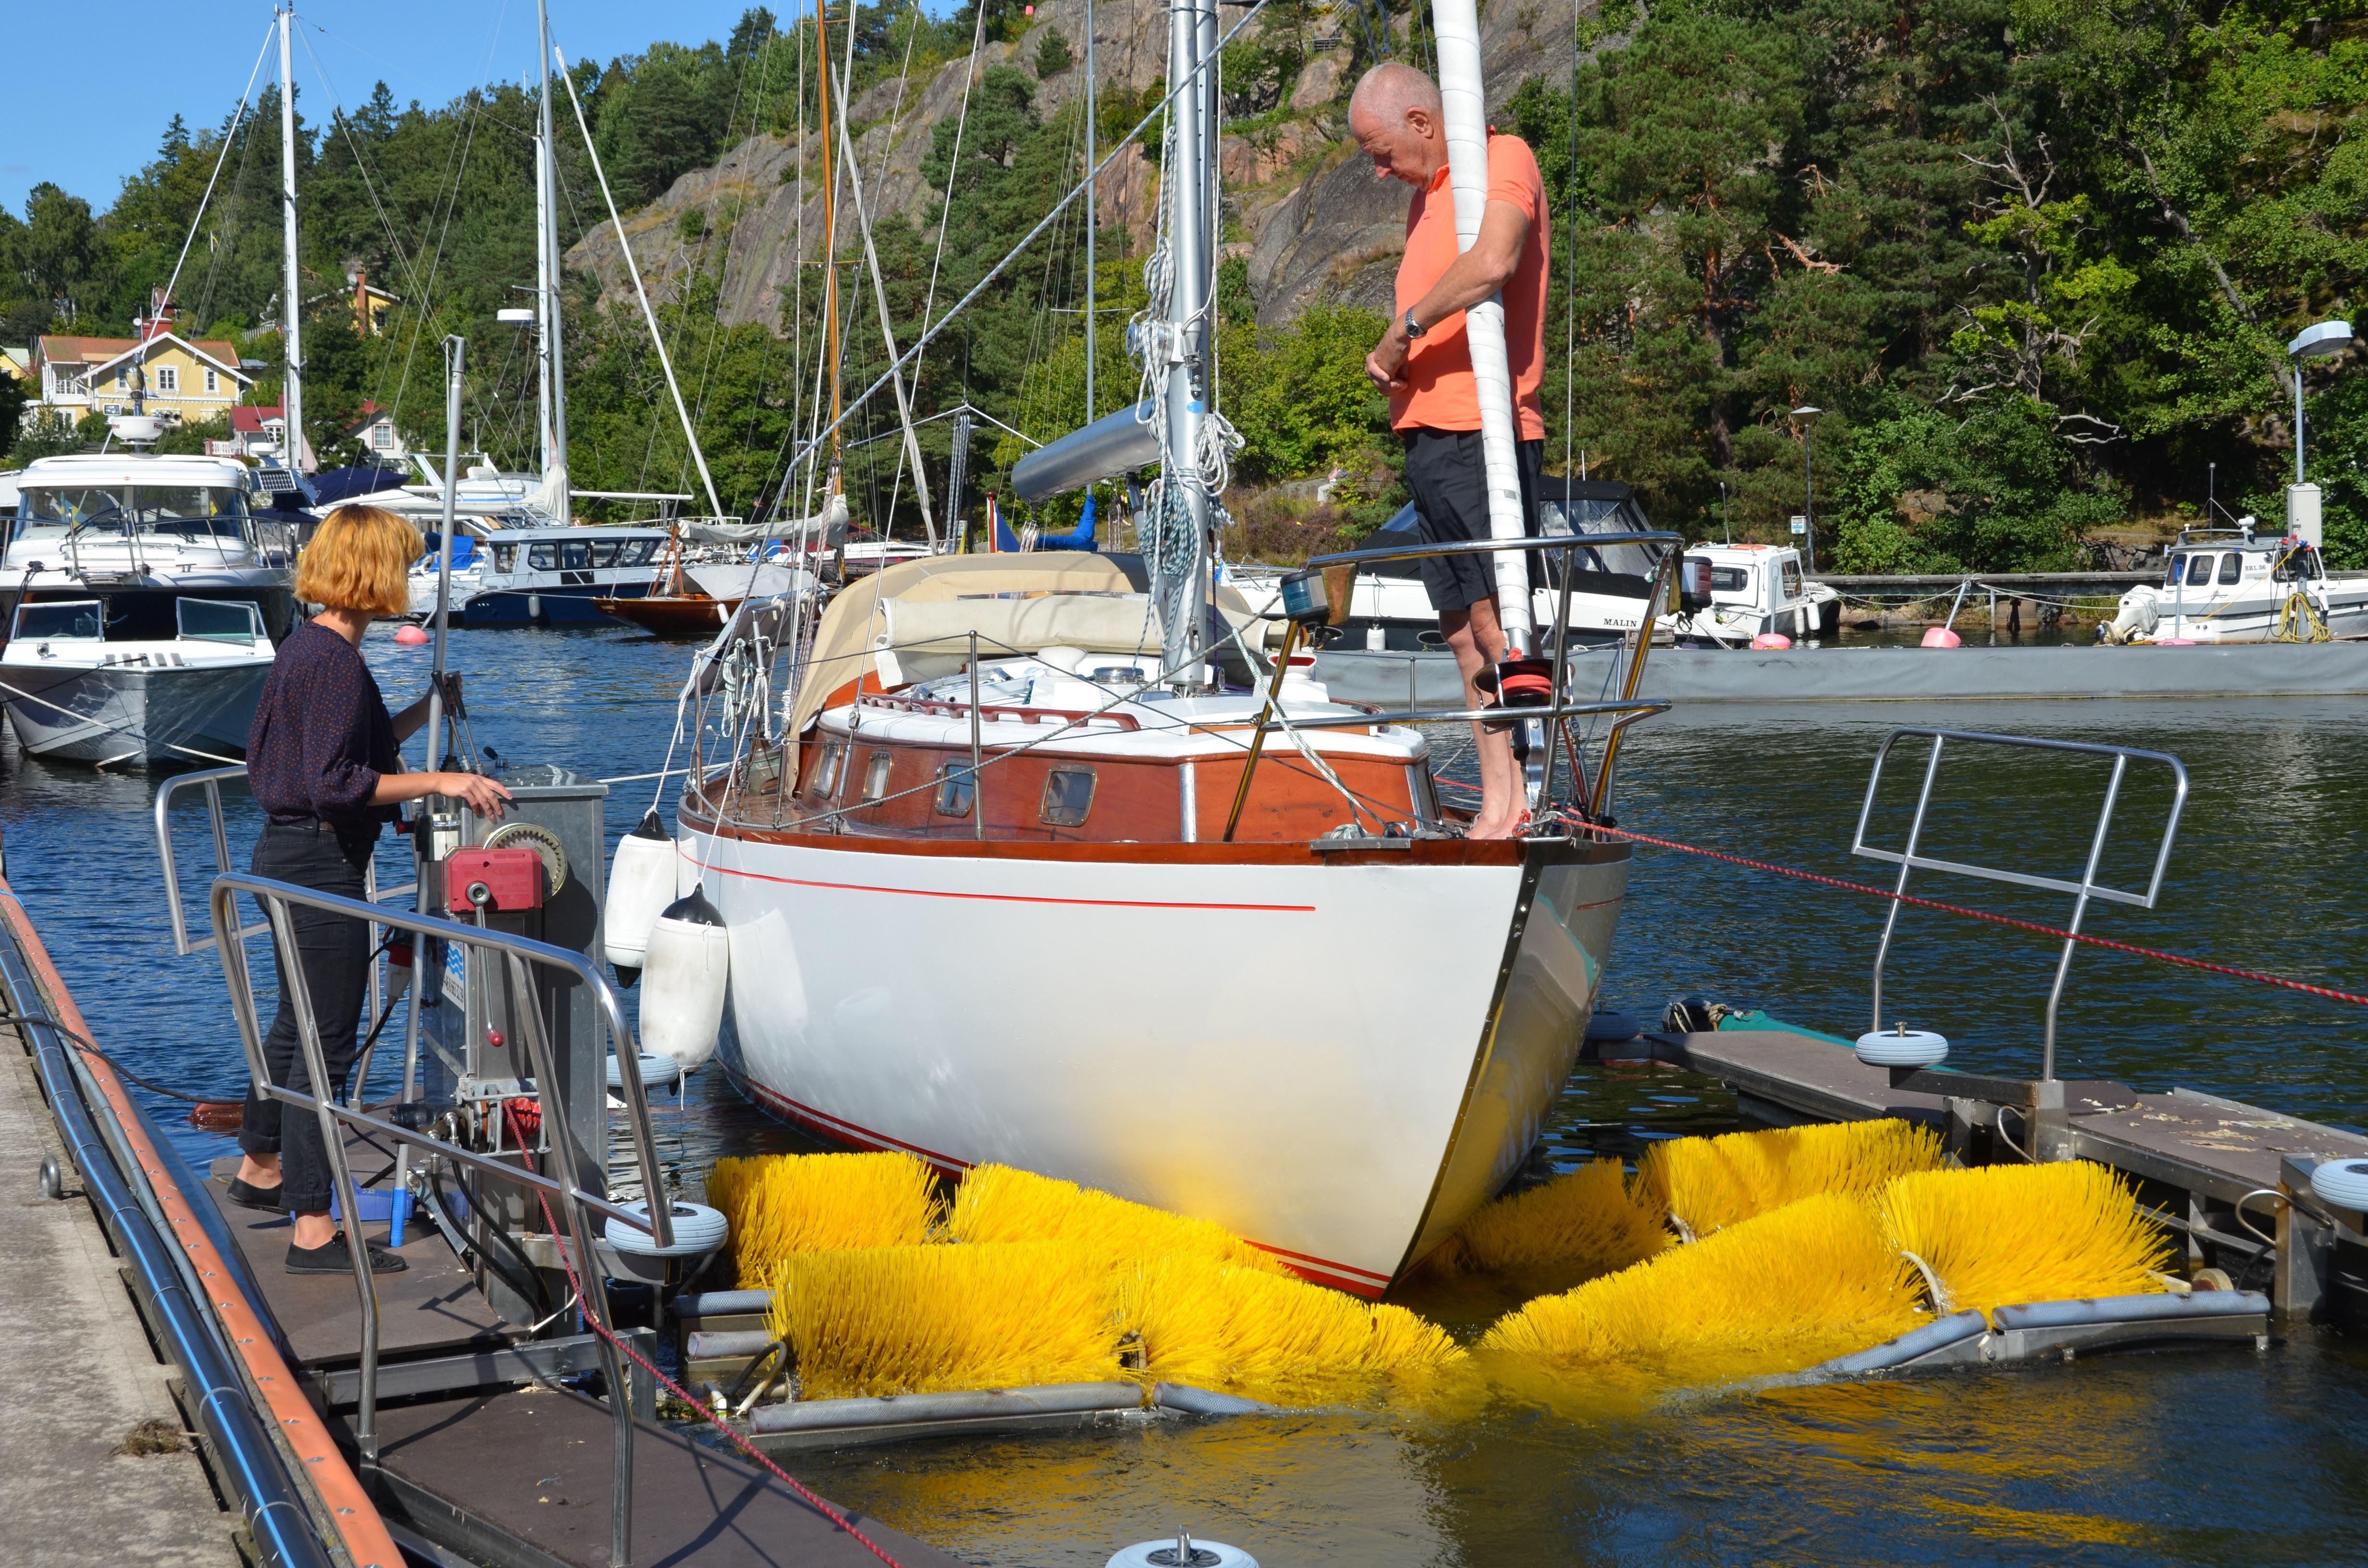 Seminarium - Miljöproblematik i småbåtshamnar